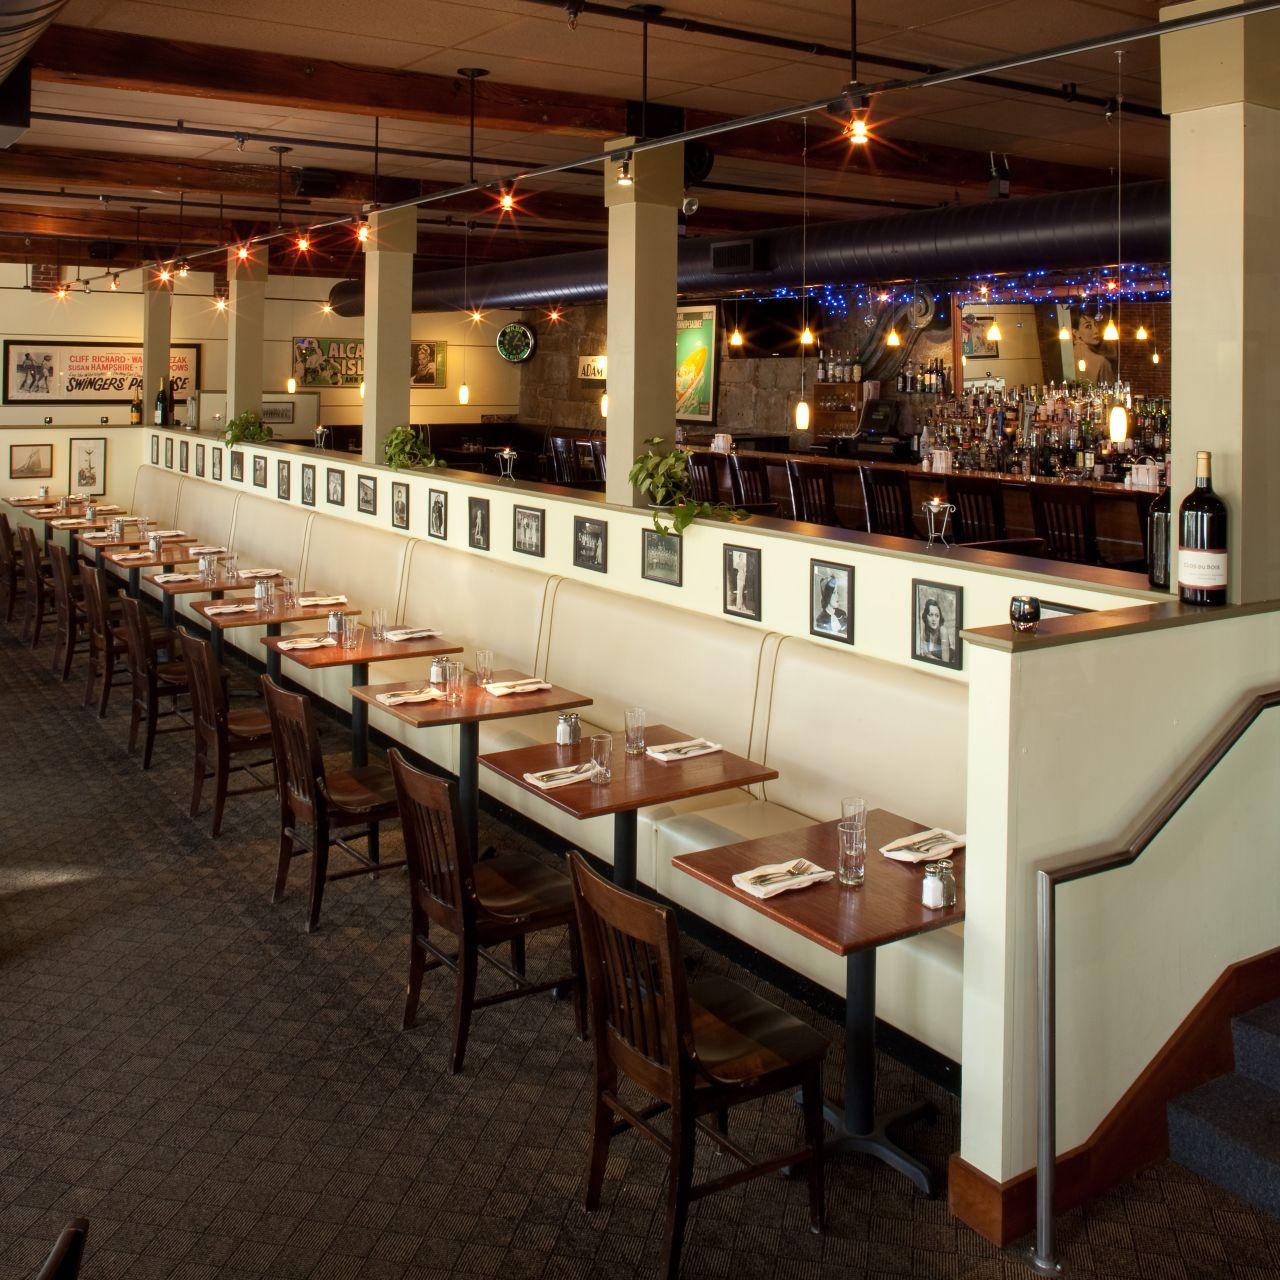 Cotton Restaurant Manchester Nh Opentable